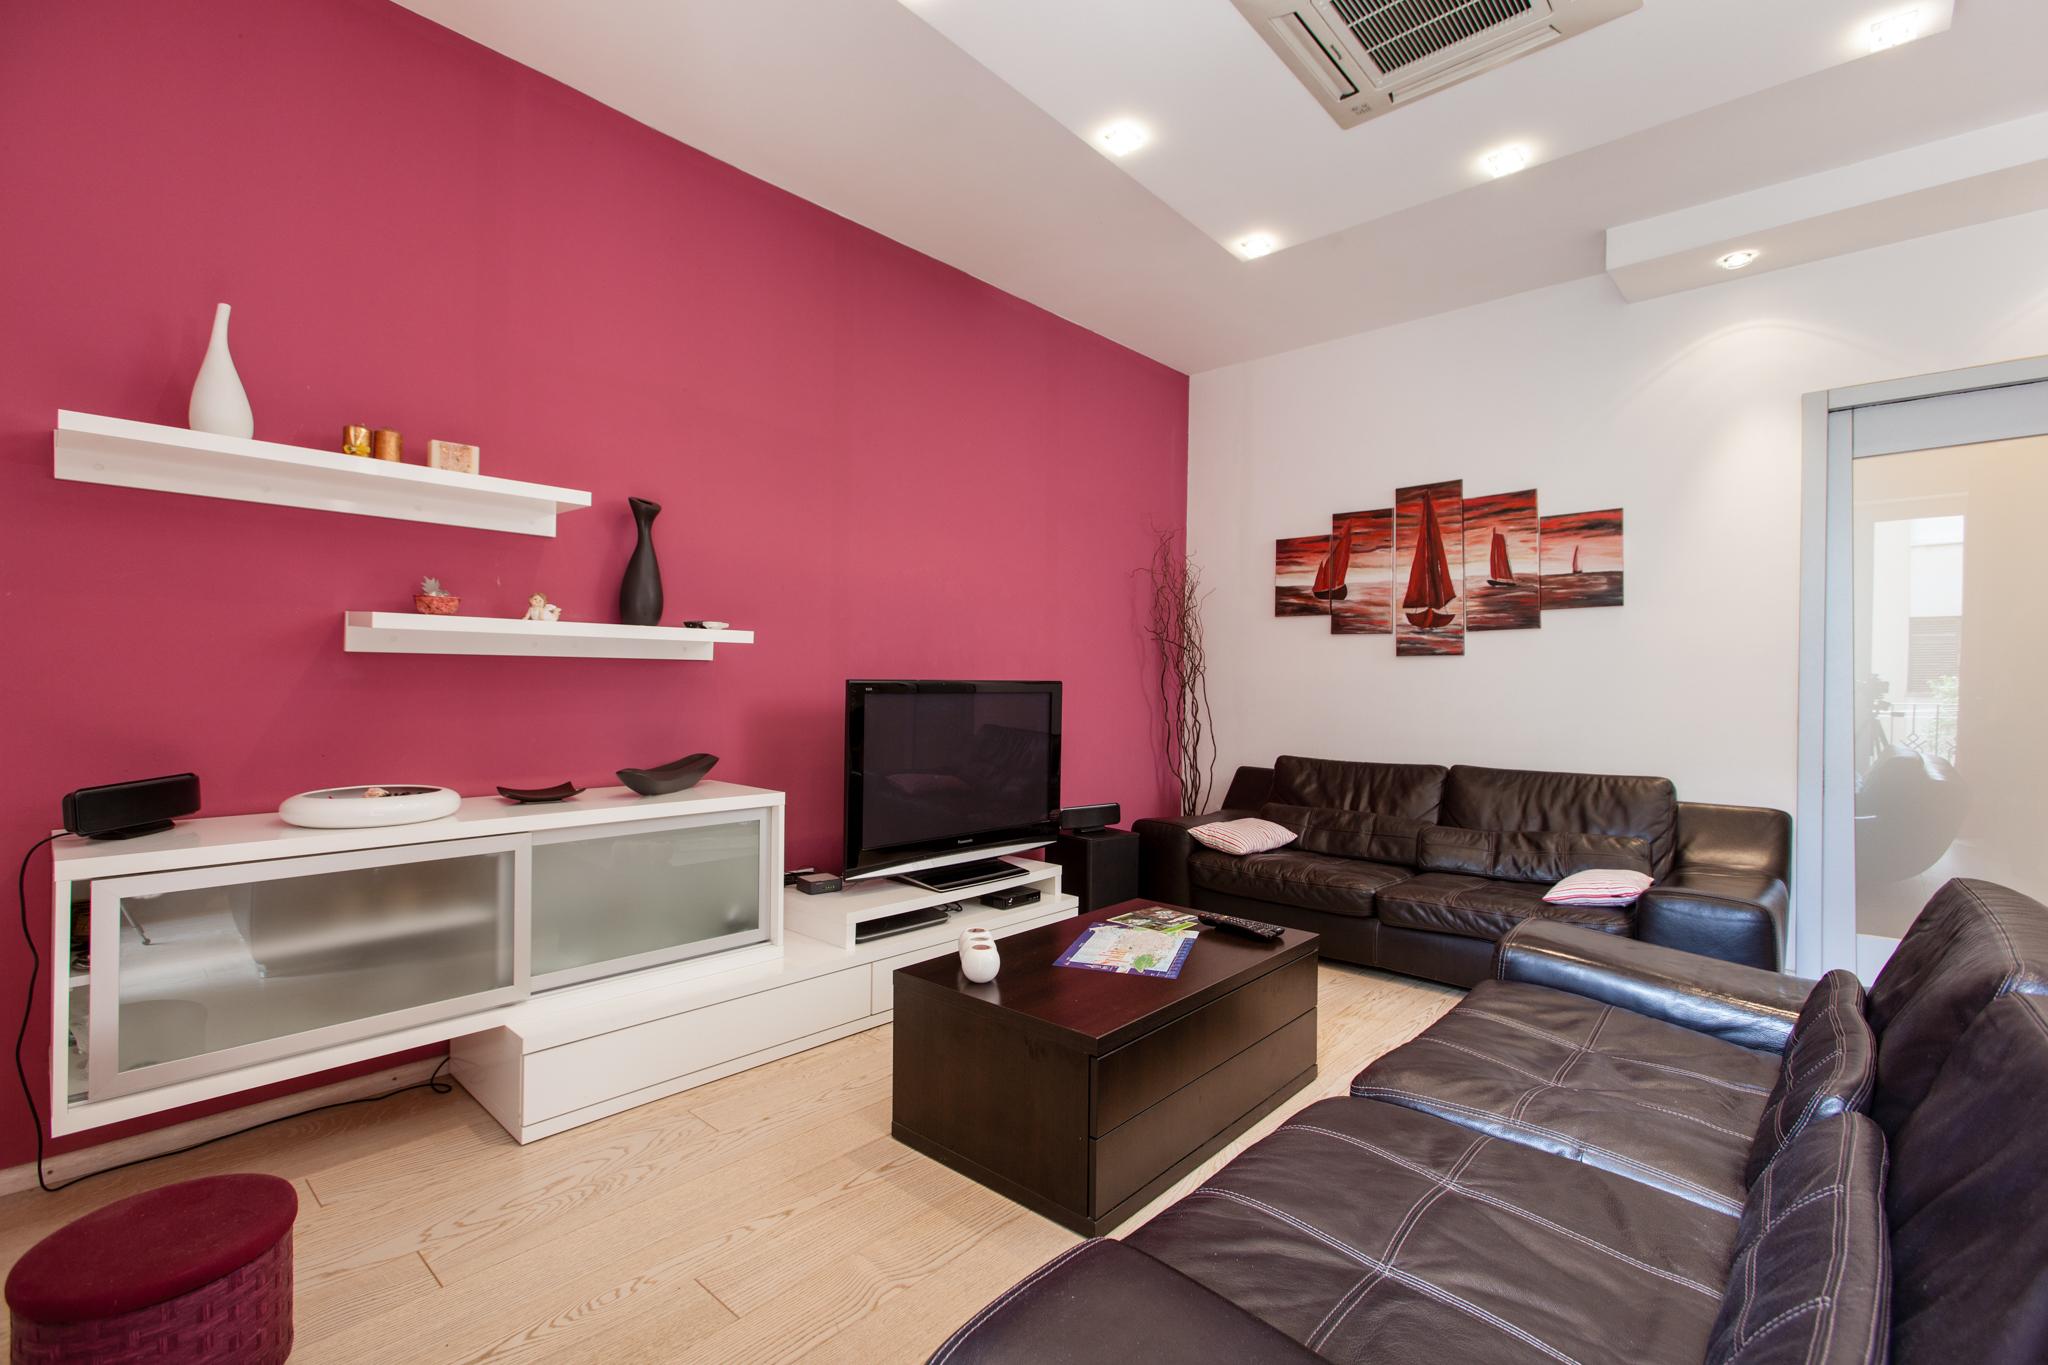 Apartment Split - Aspalathos (16)